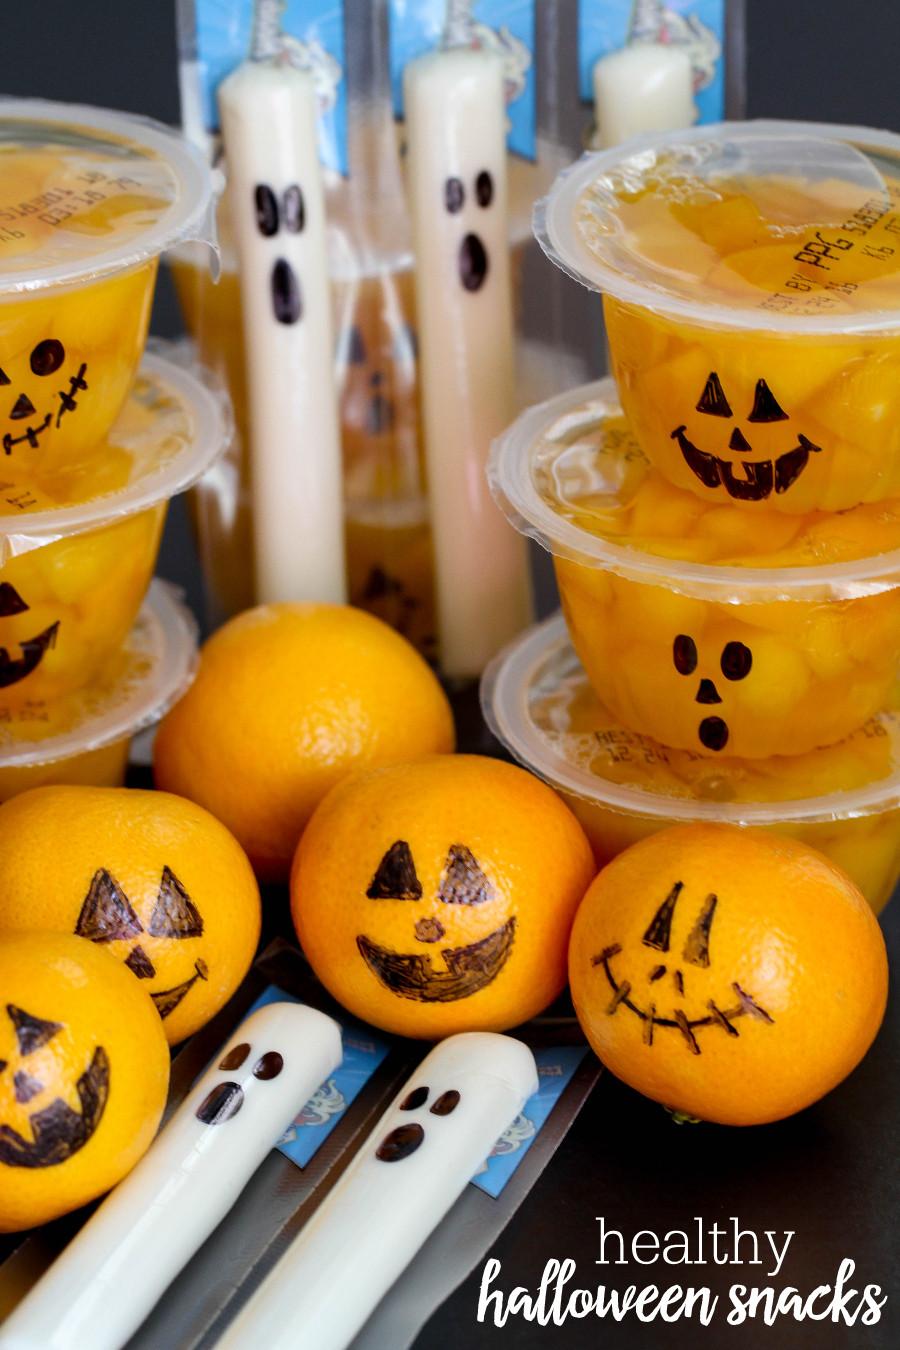 Healthy Halloween Snacks For School  Healthy Halloween Snacks Lil Luna